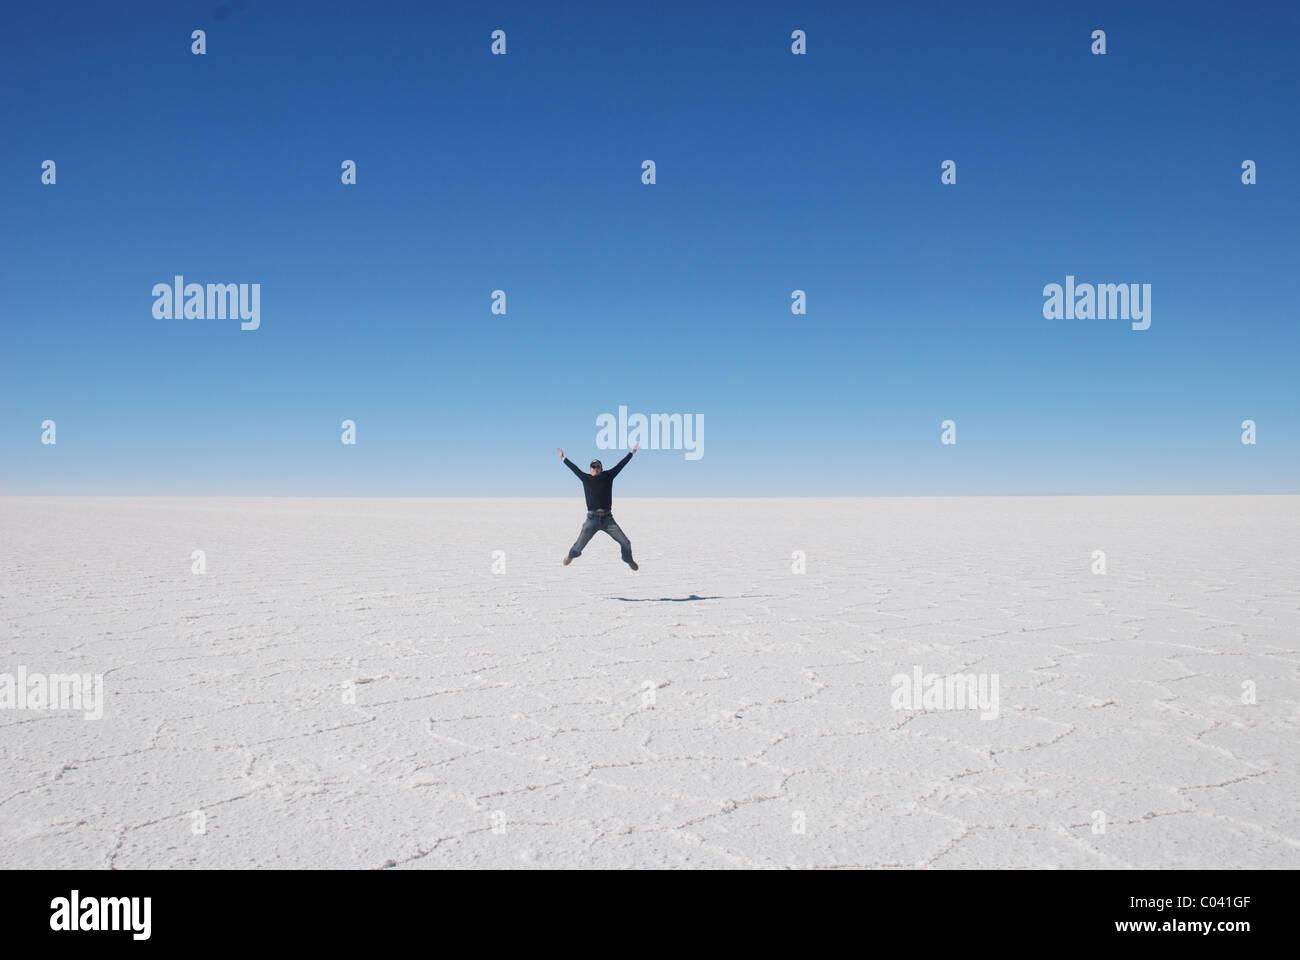 A Star-jump in Salar de Uyuni - the salt flats of Uyuni, Bolivia - Stock Image